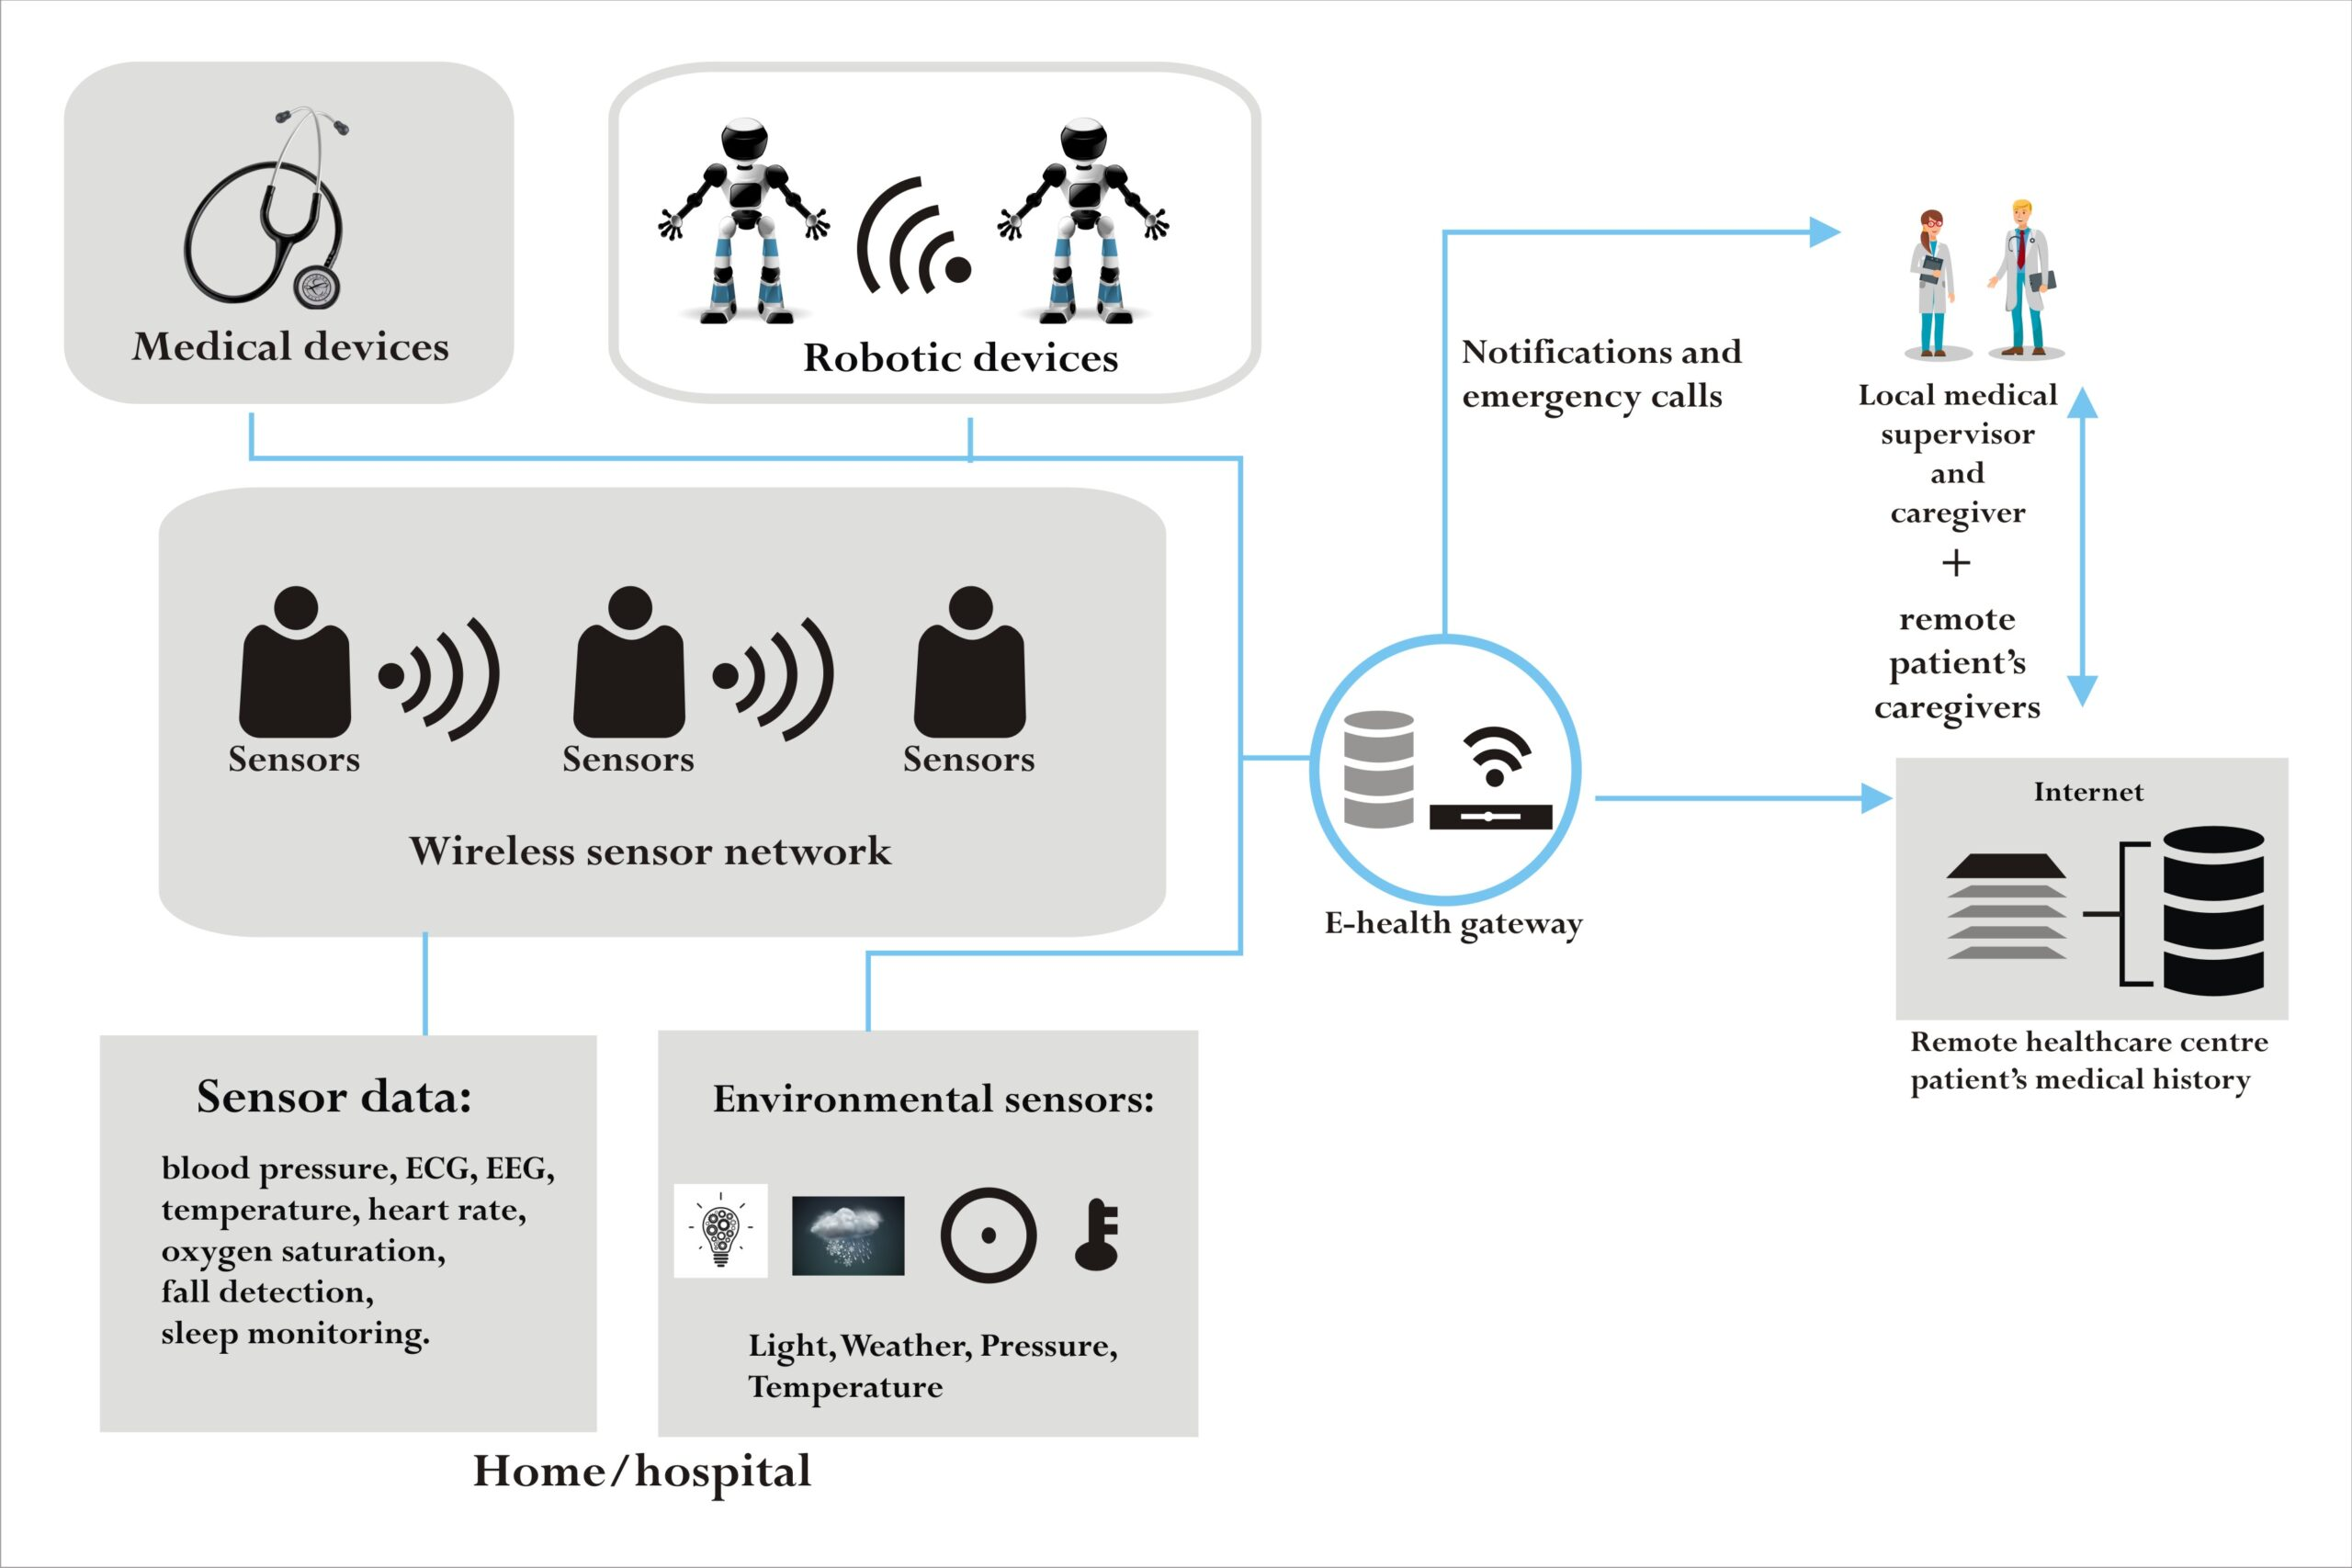 IoT and robotics